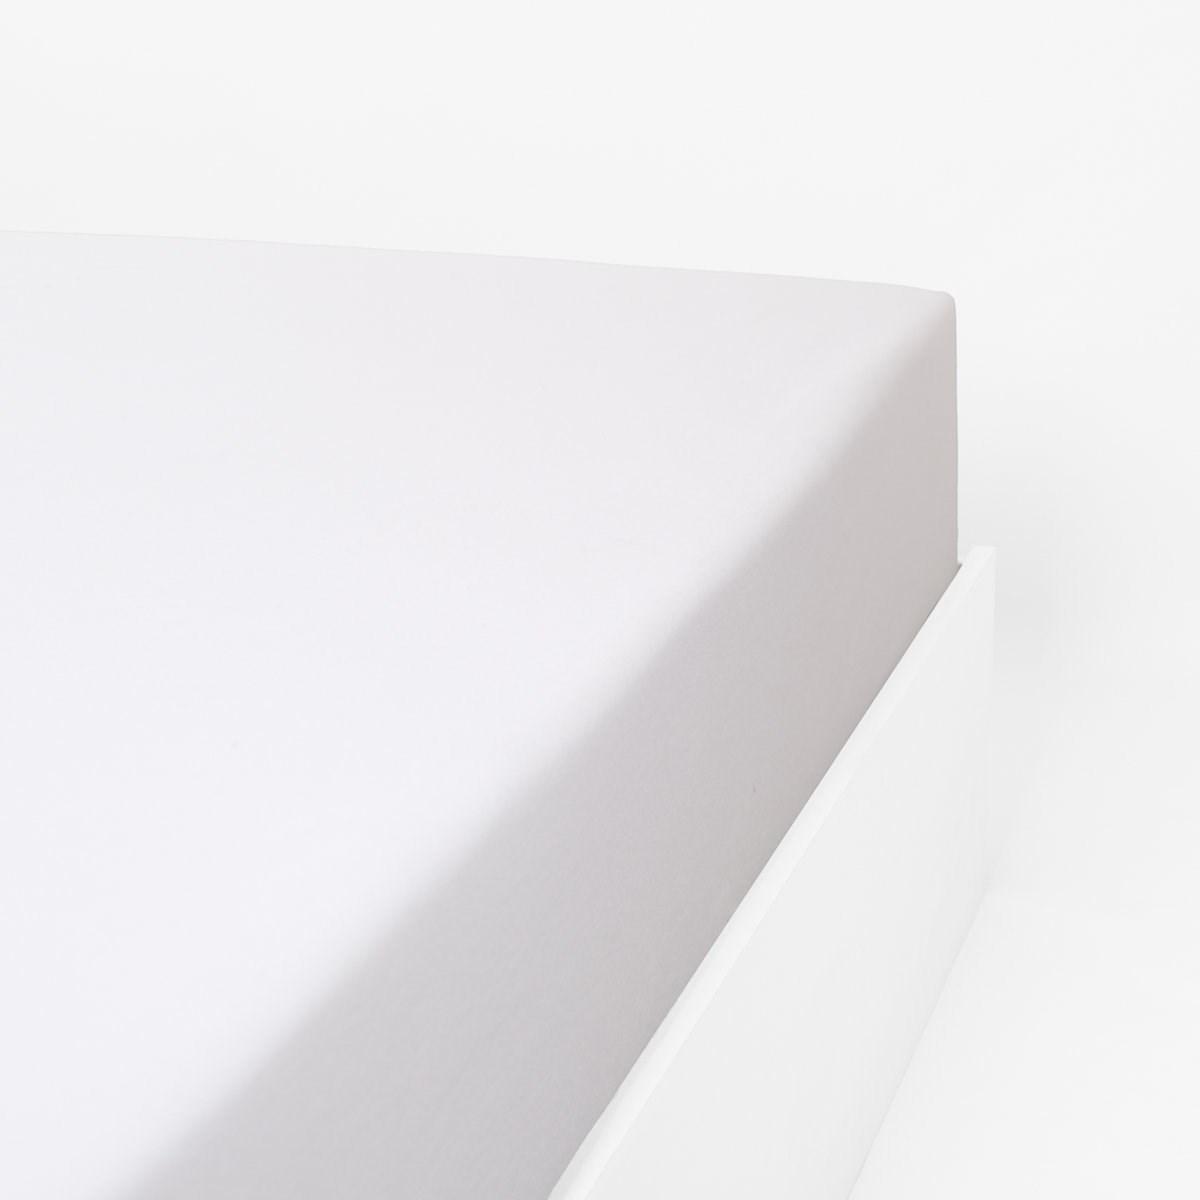 Drap housse flanelle en Molleton Blanc 140x200 cm